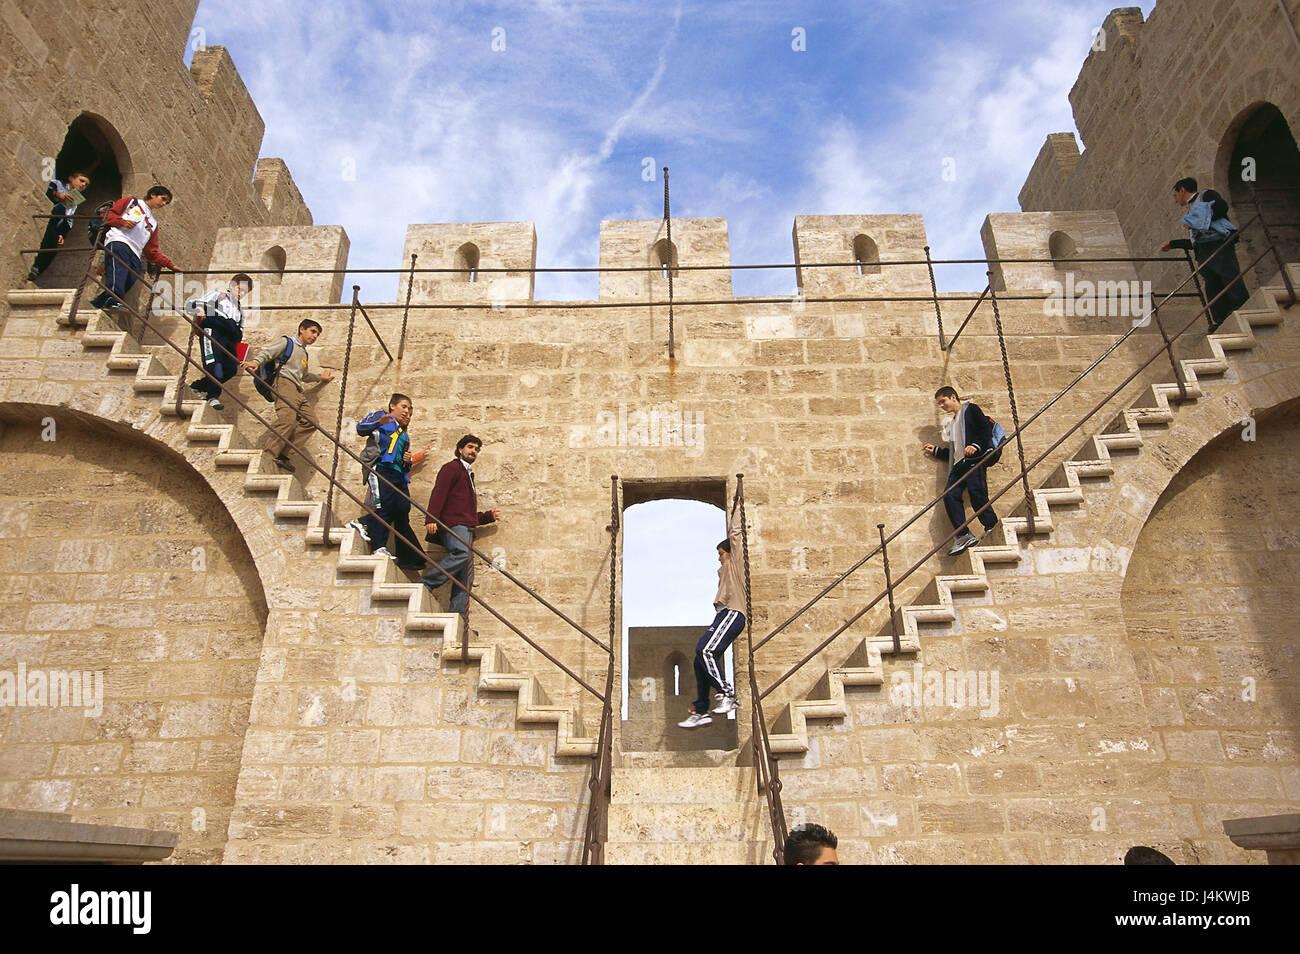 Spain, Valencia, town gate, Puerta de Serranos, stairs, visitor, no ...